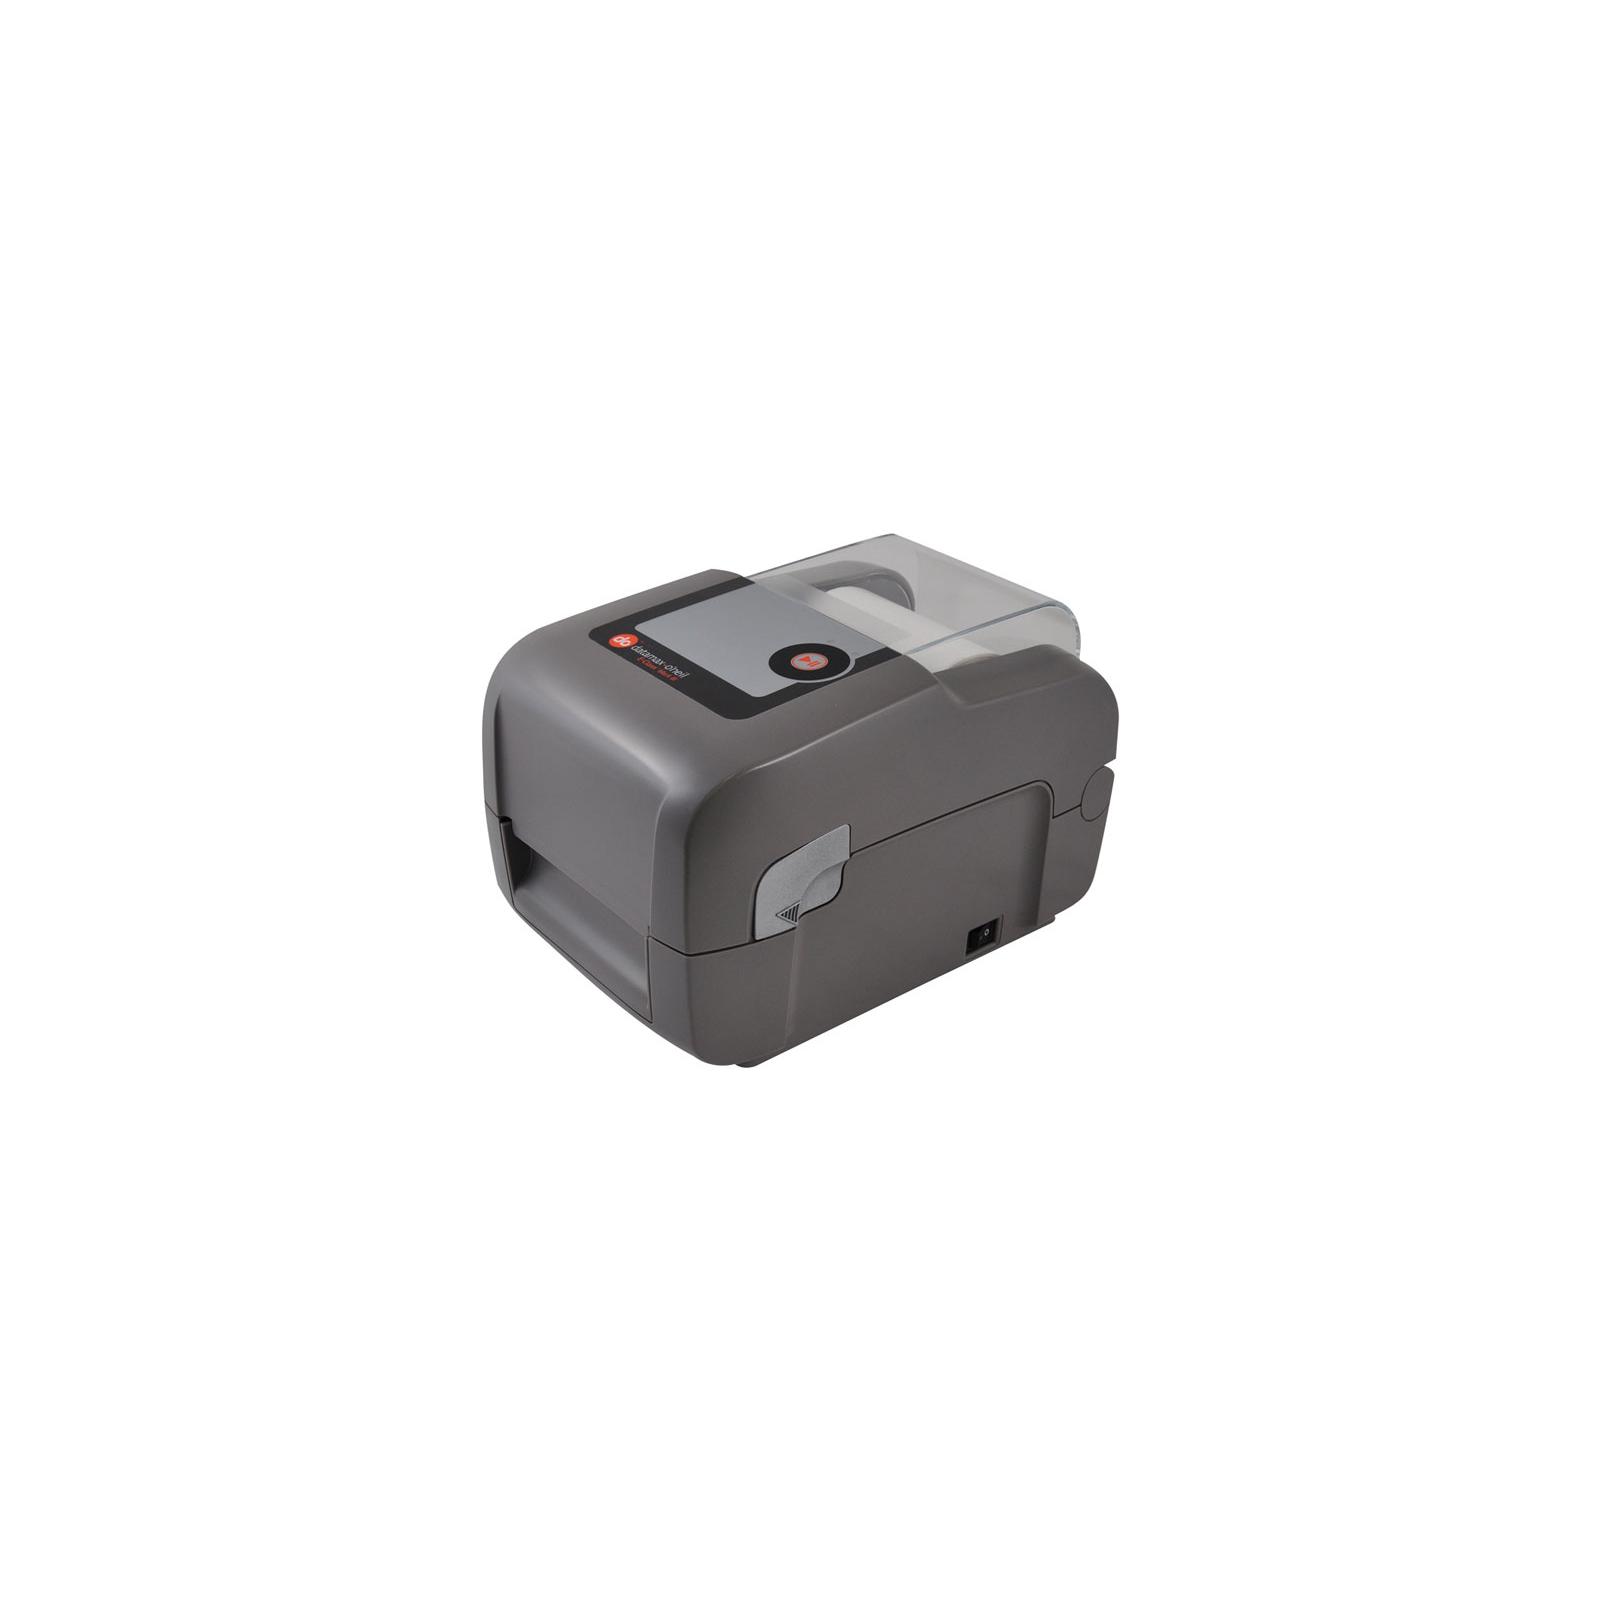 Принтер этикеток Datamax-O'neil E-Class Mark III E-4304B, 300dpi (EB3-00-1E001B00)